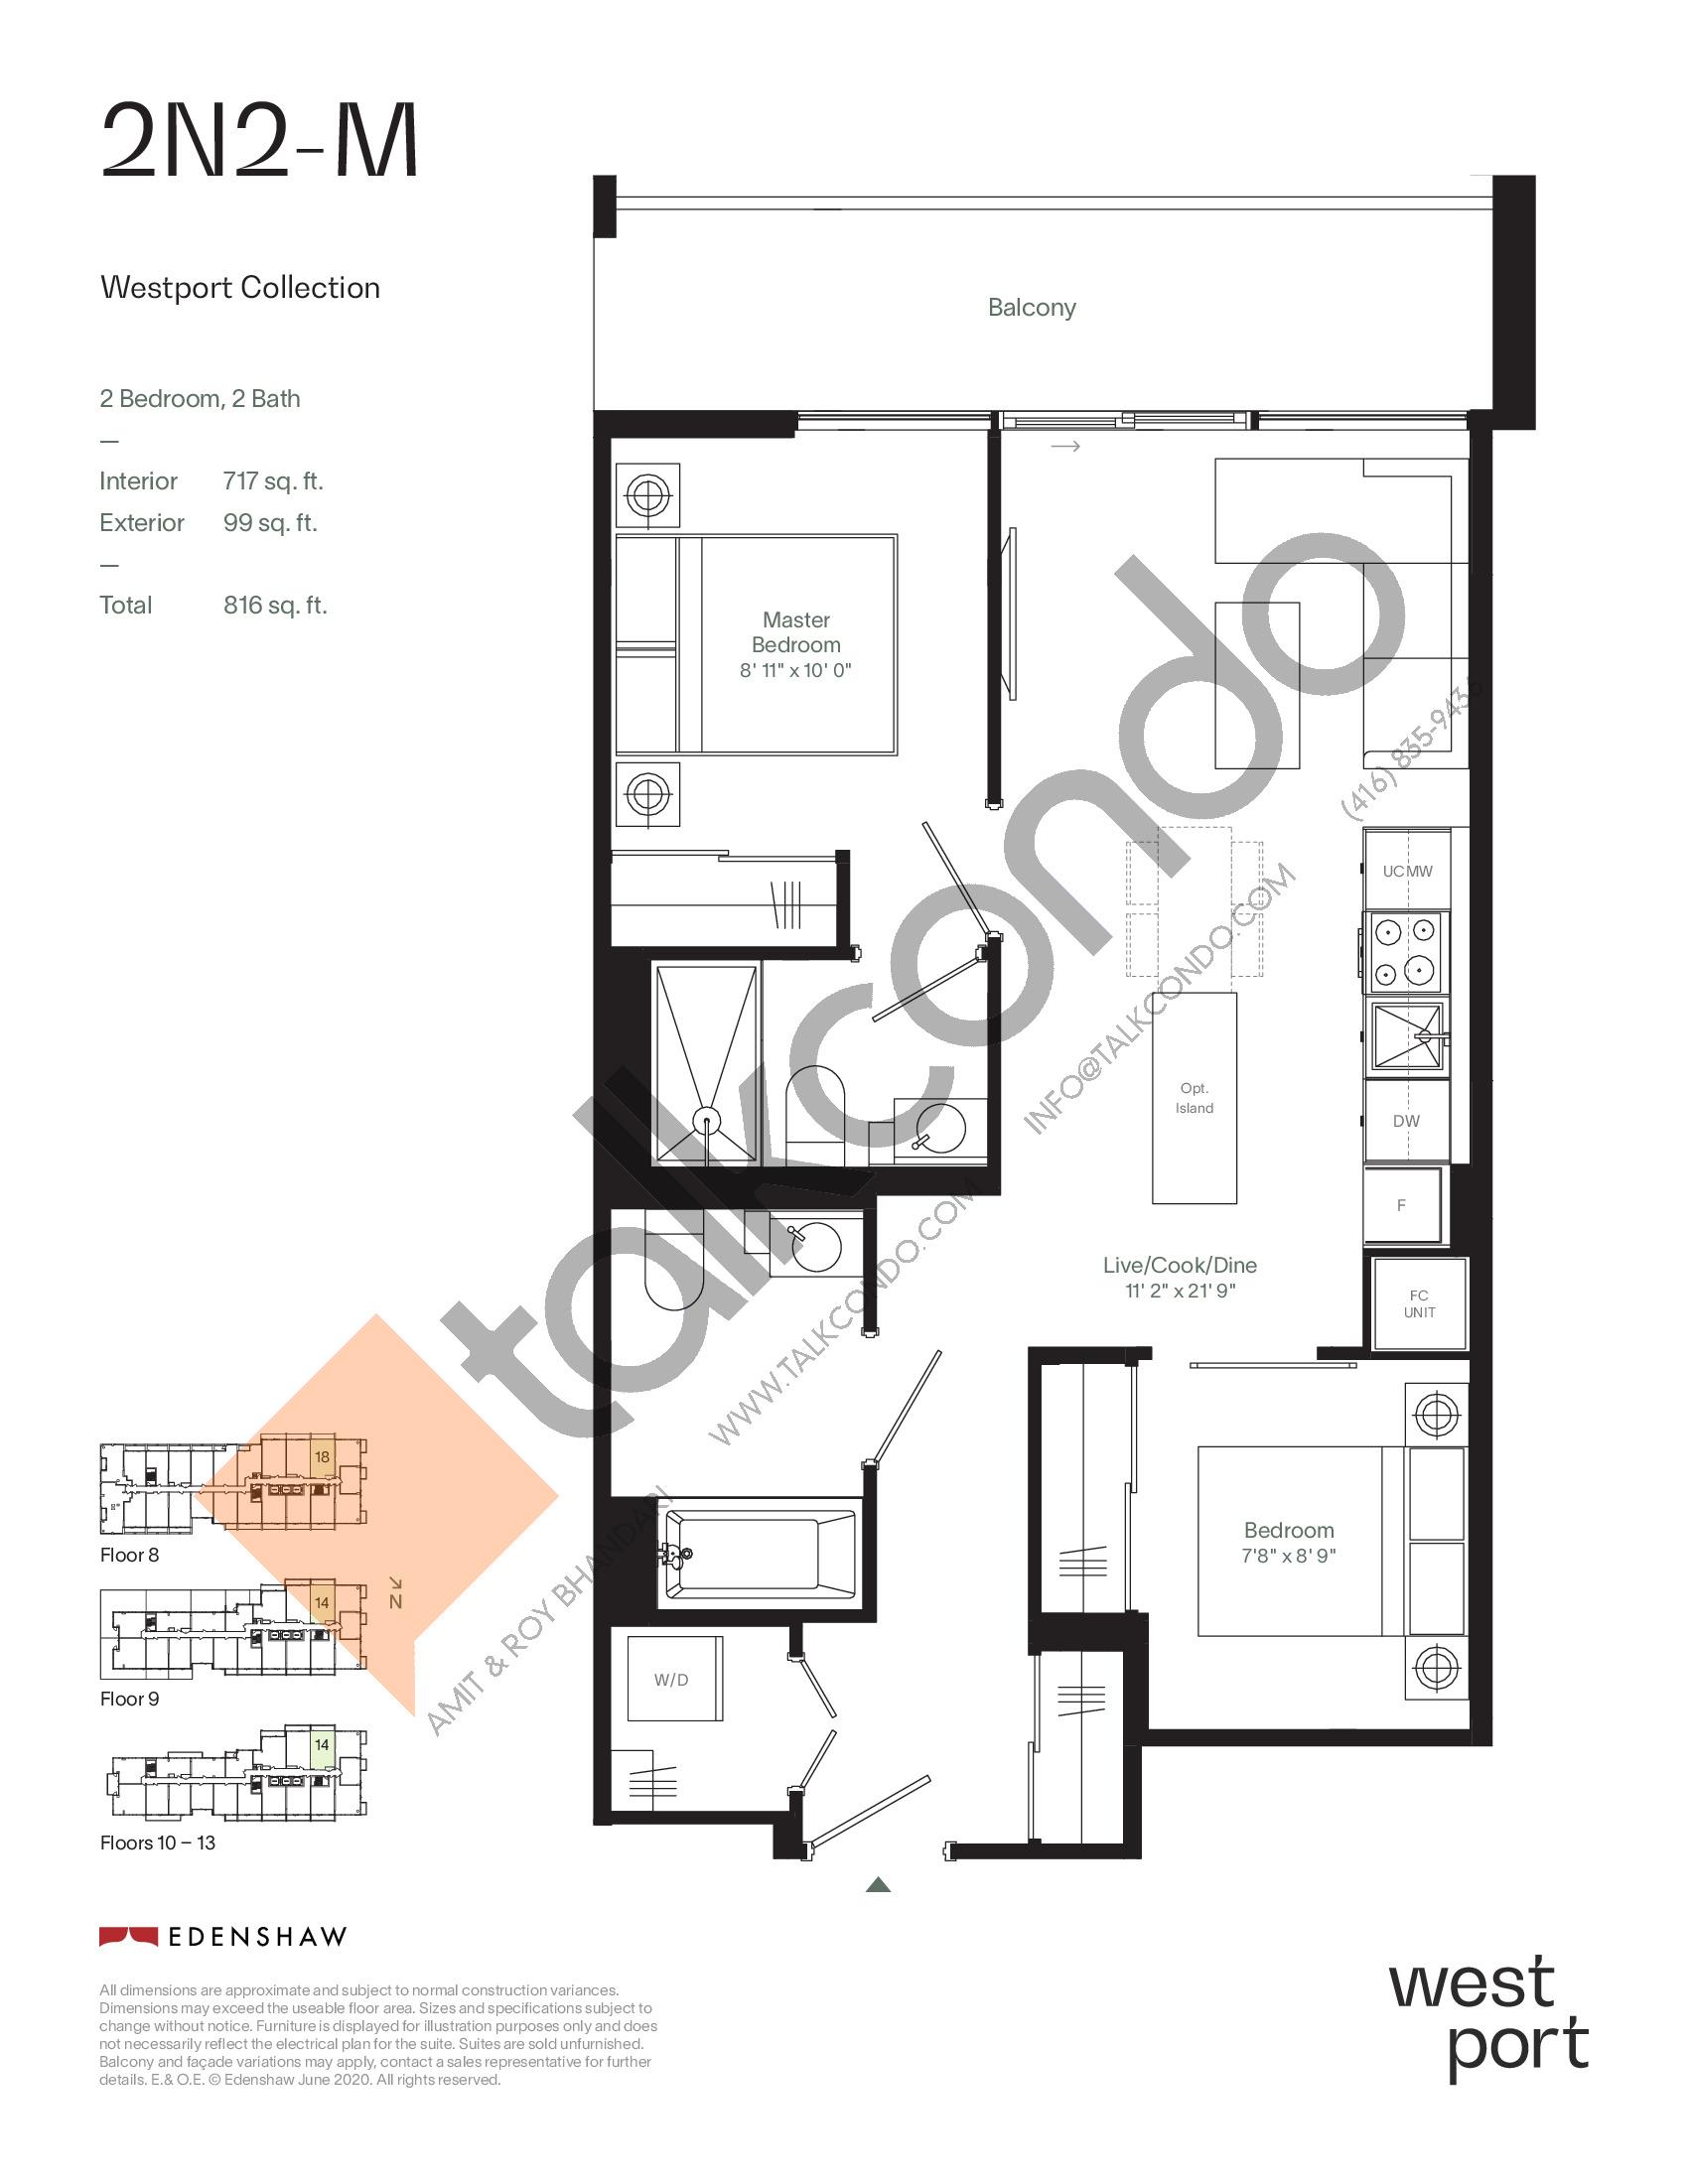 2N2-M - Westport Collection Floor Plan at Westport Condos - 717 sq.ft